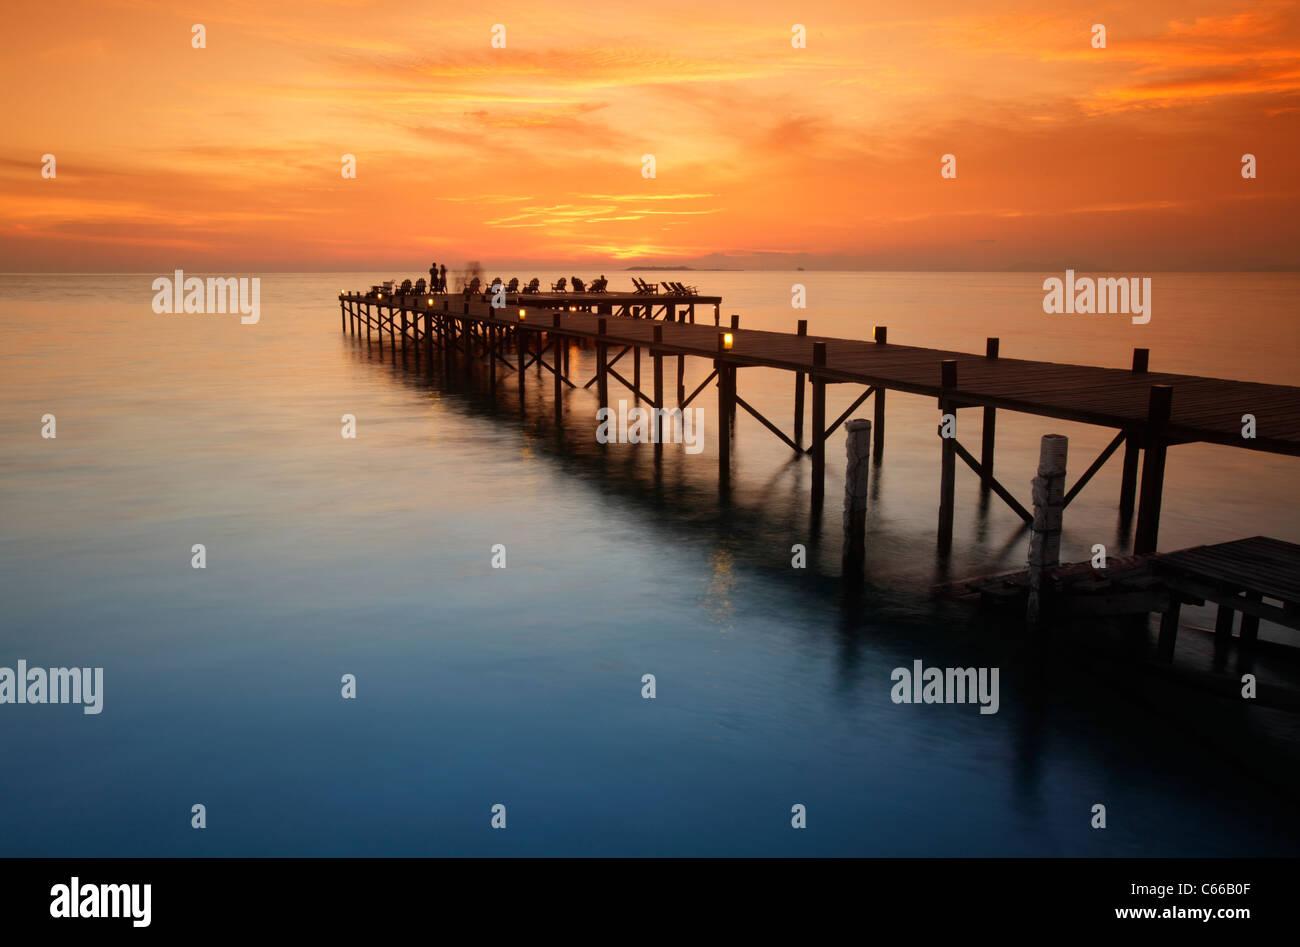 Steg am Sonnenuntergang St Kapalai Resort, Kapalai Insel Borneo, Malaysia Stockbild